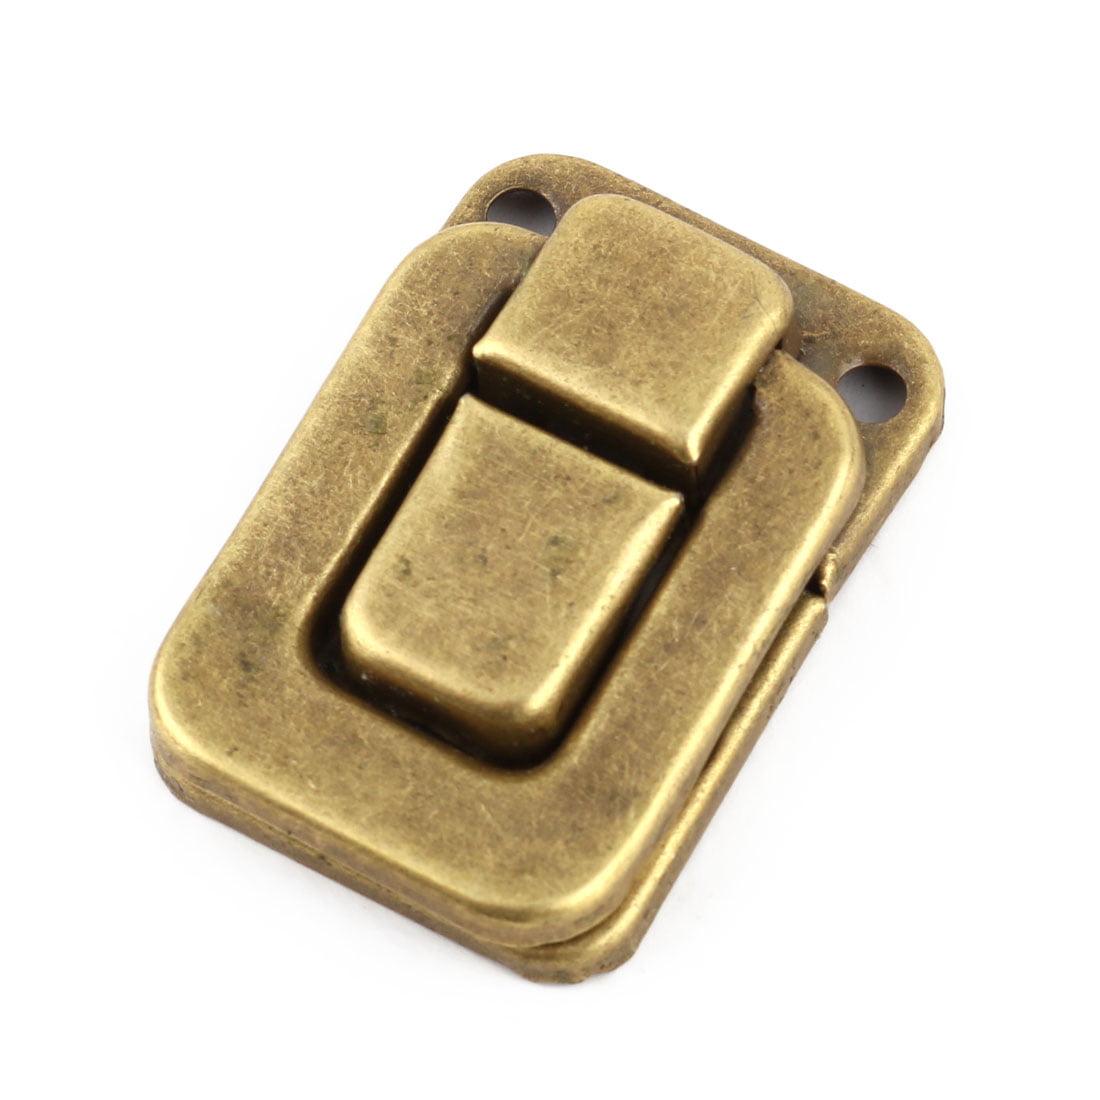 Household Metal Suitcase Lock Hook Hinge Toggle Box Latch Hasp Brass Tone 5 Pcs - image 3 of 4